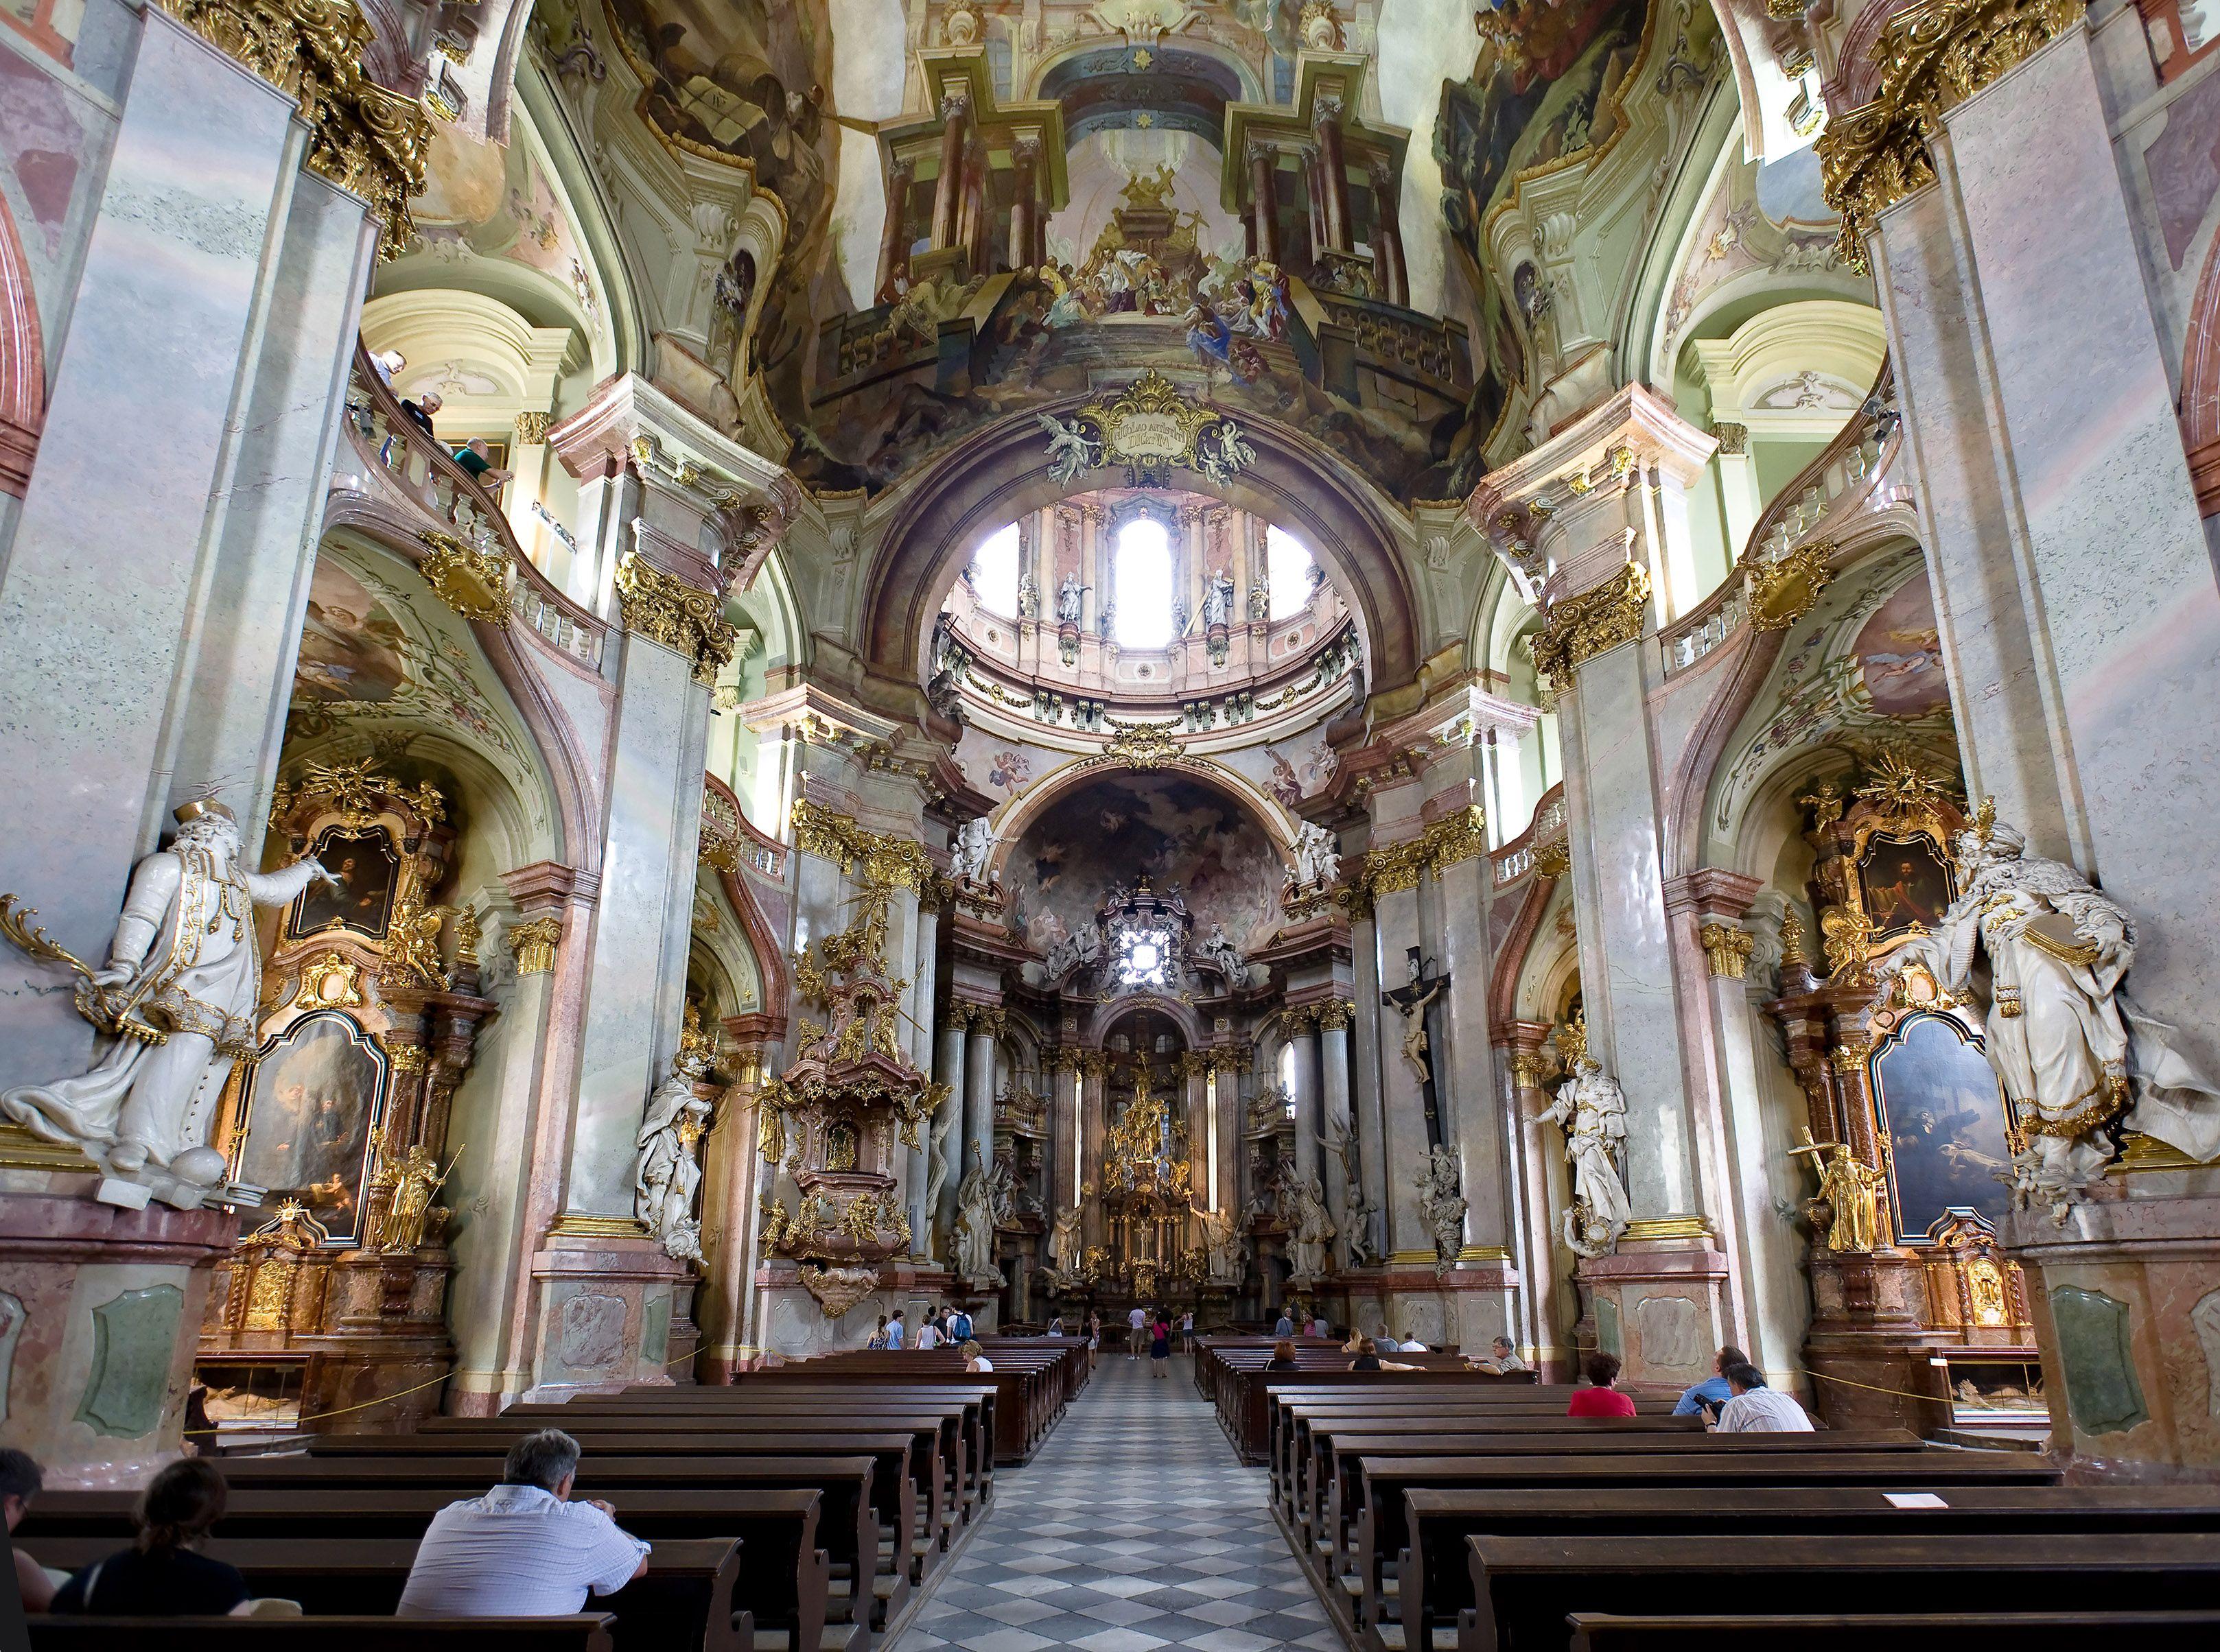 Baroque Architecture Czech Republic Church Of St Nicolas Prague 1703 21 By Christoph Dientzenhofer 1655 1722 With His Father Ignaz Dientzenhofer